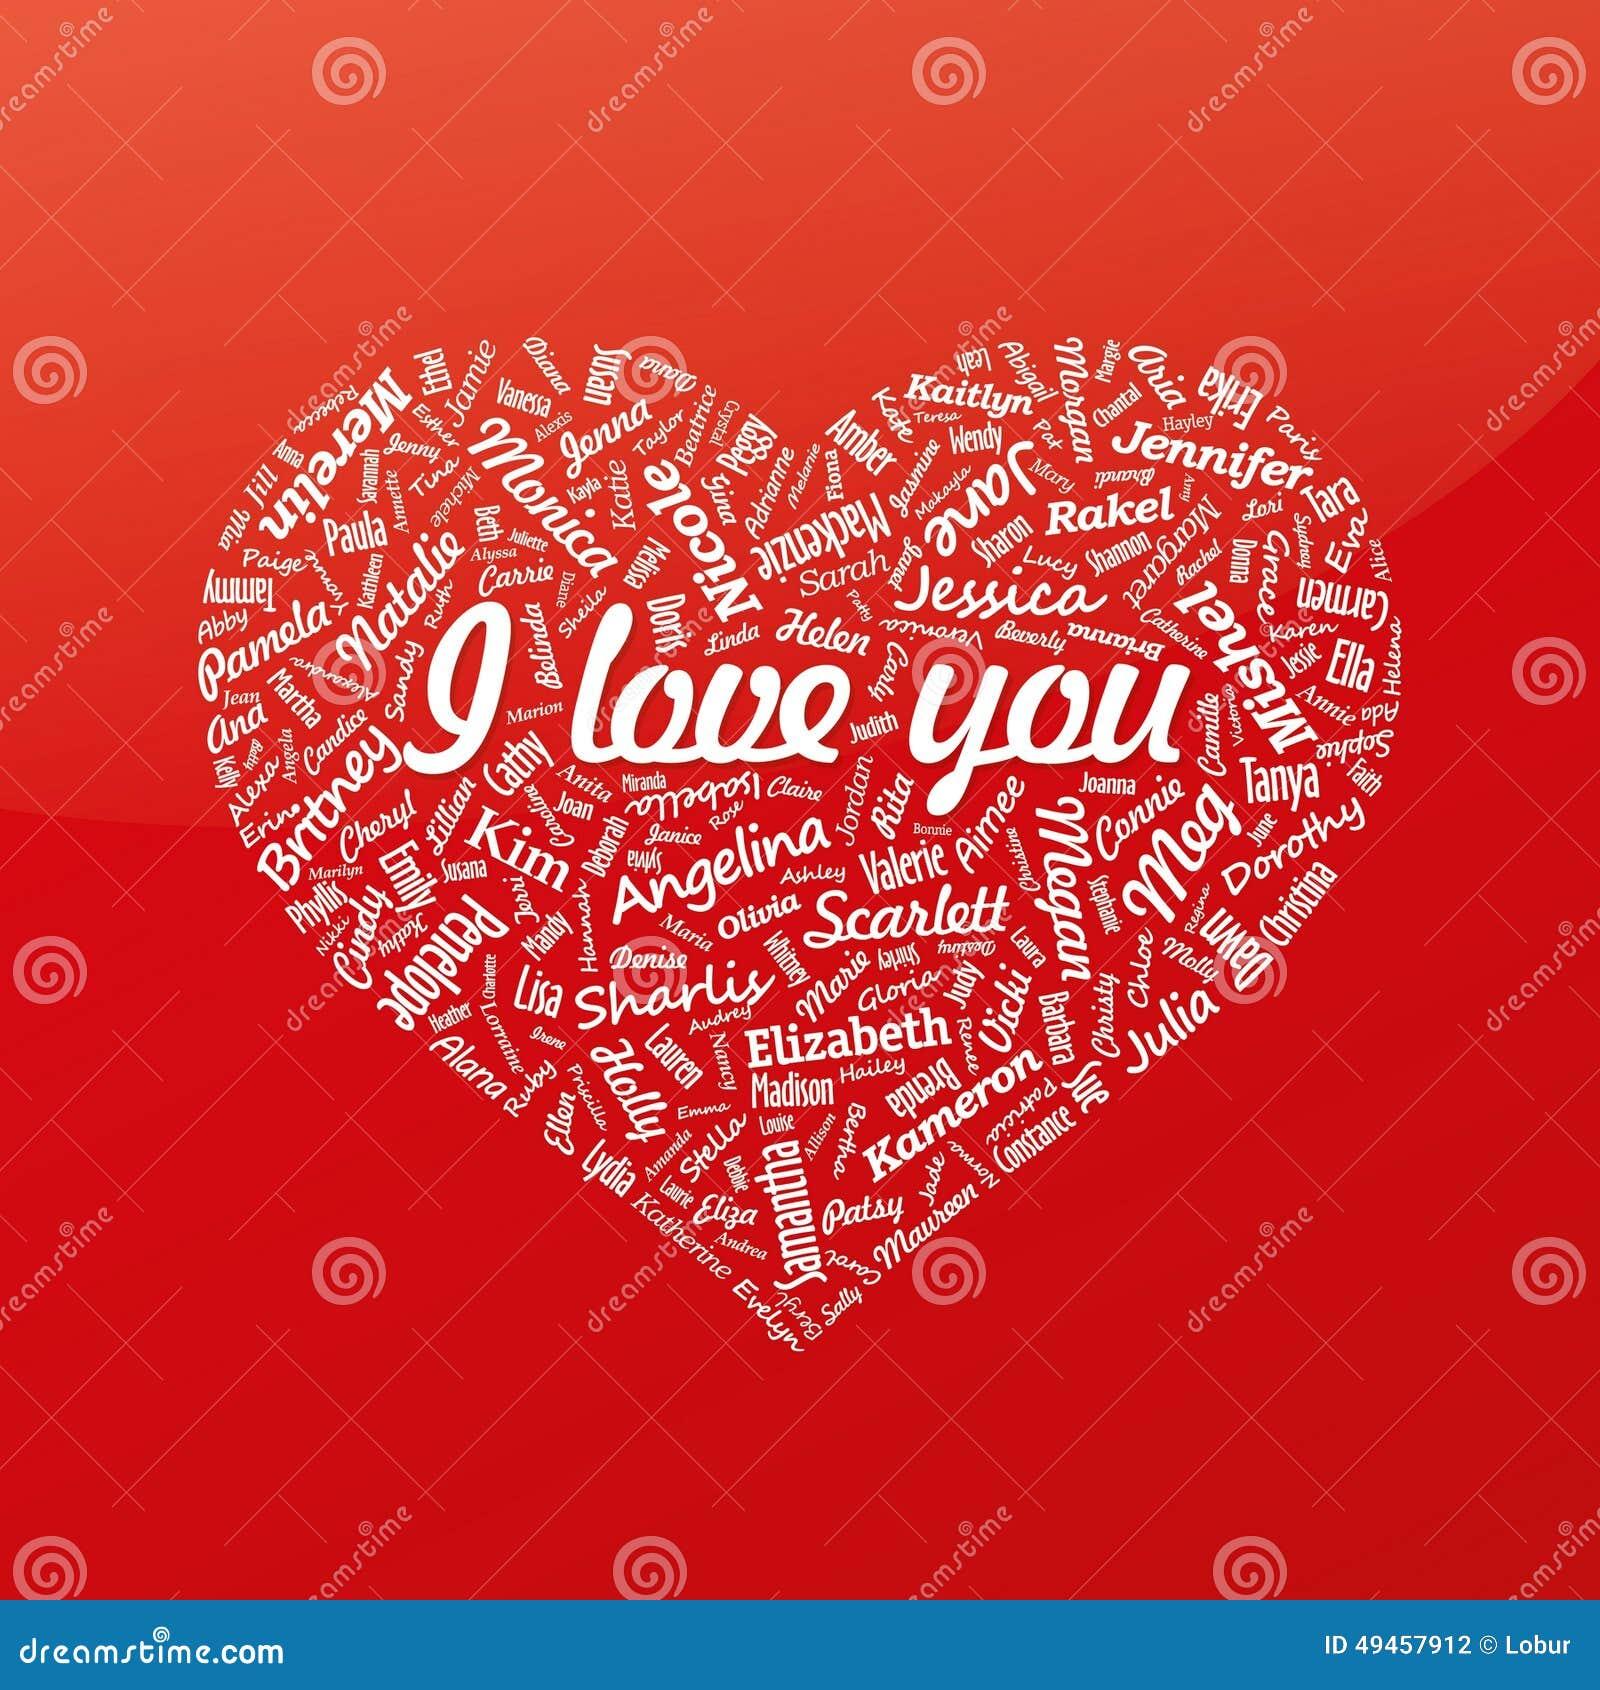 royalty free illustration - Valentines Names